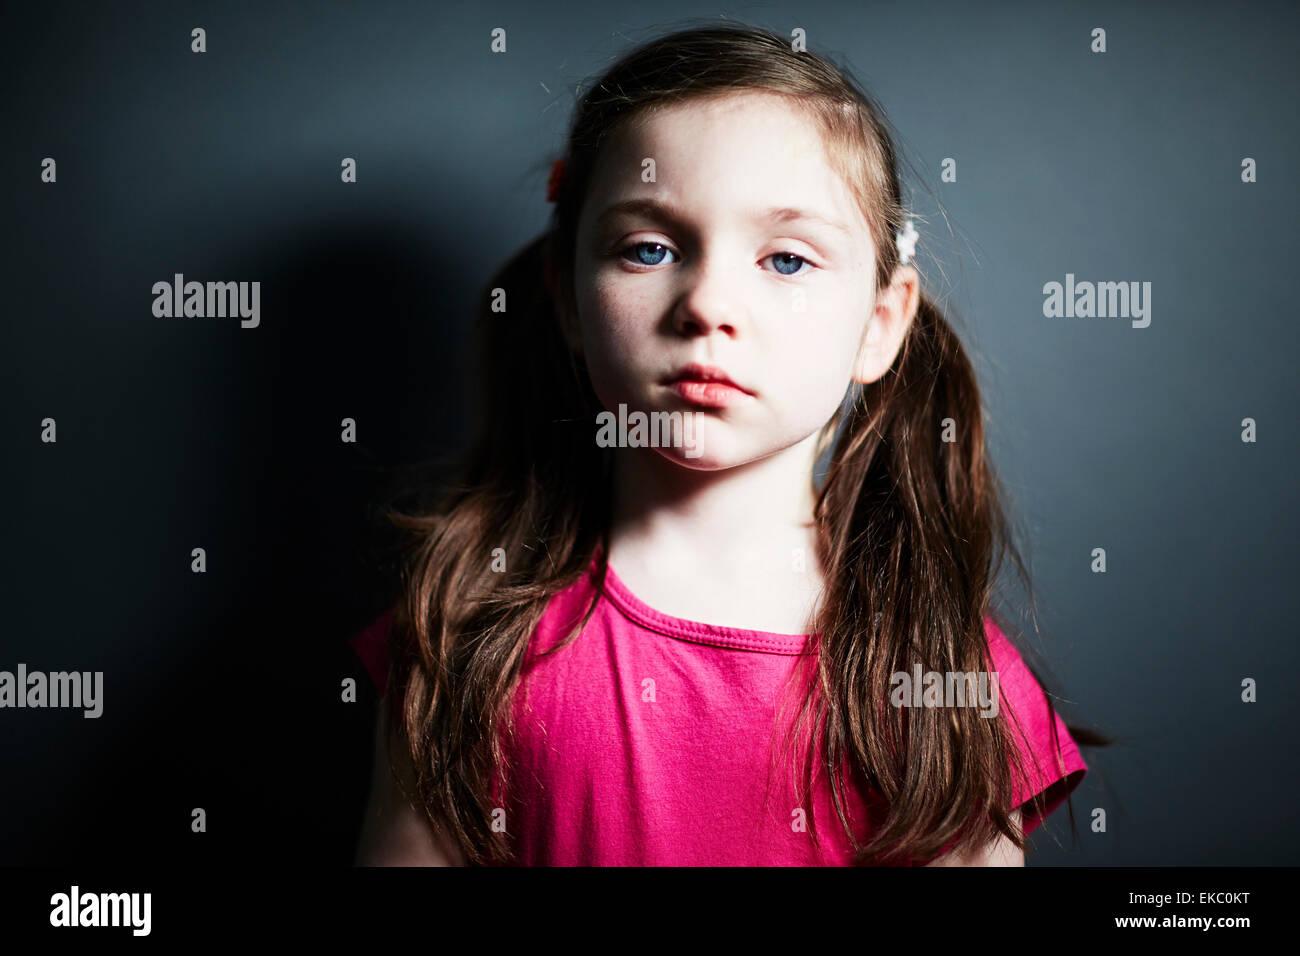 Chica con pigtails Imagen De Stock